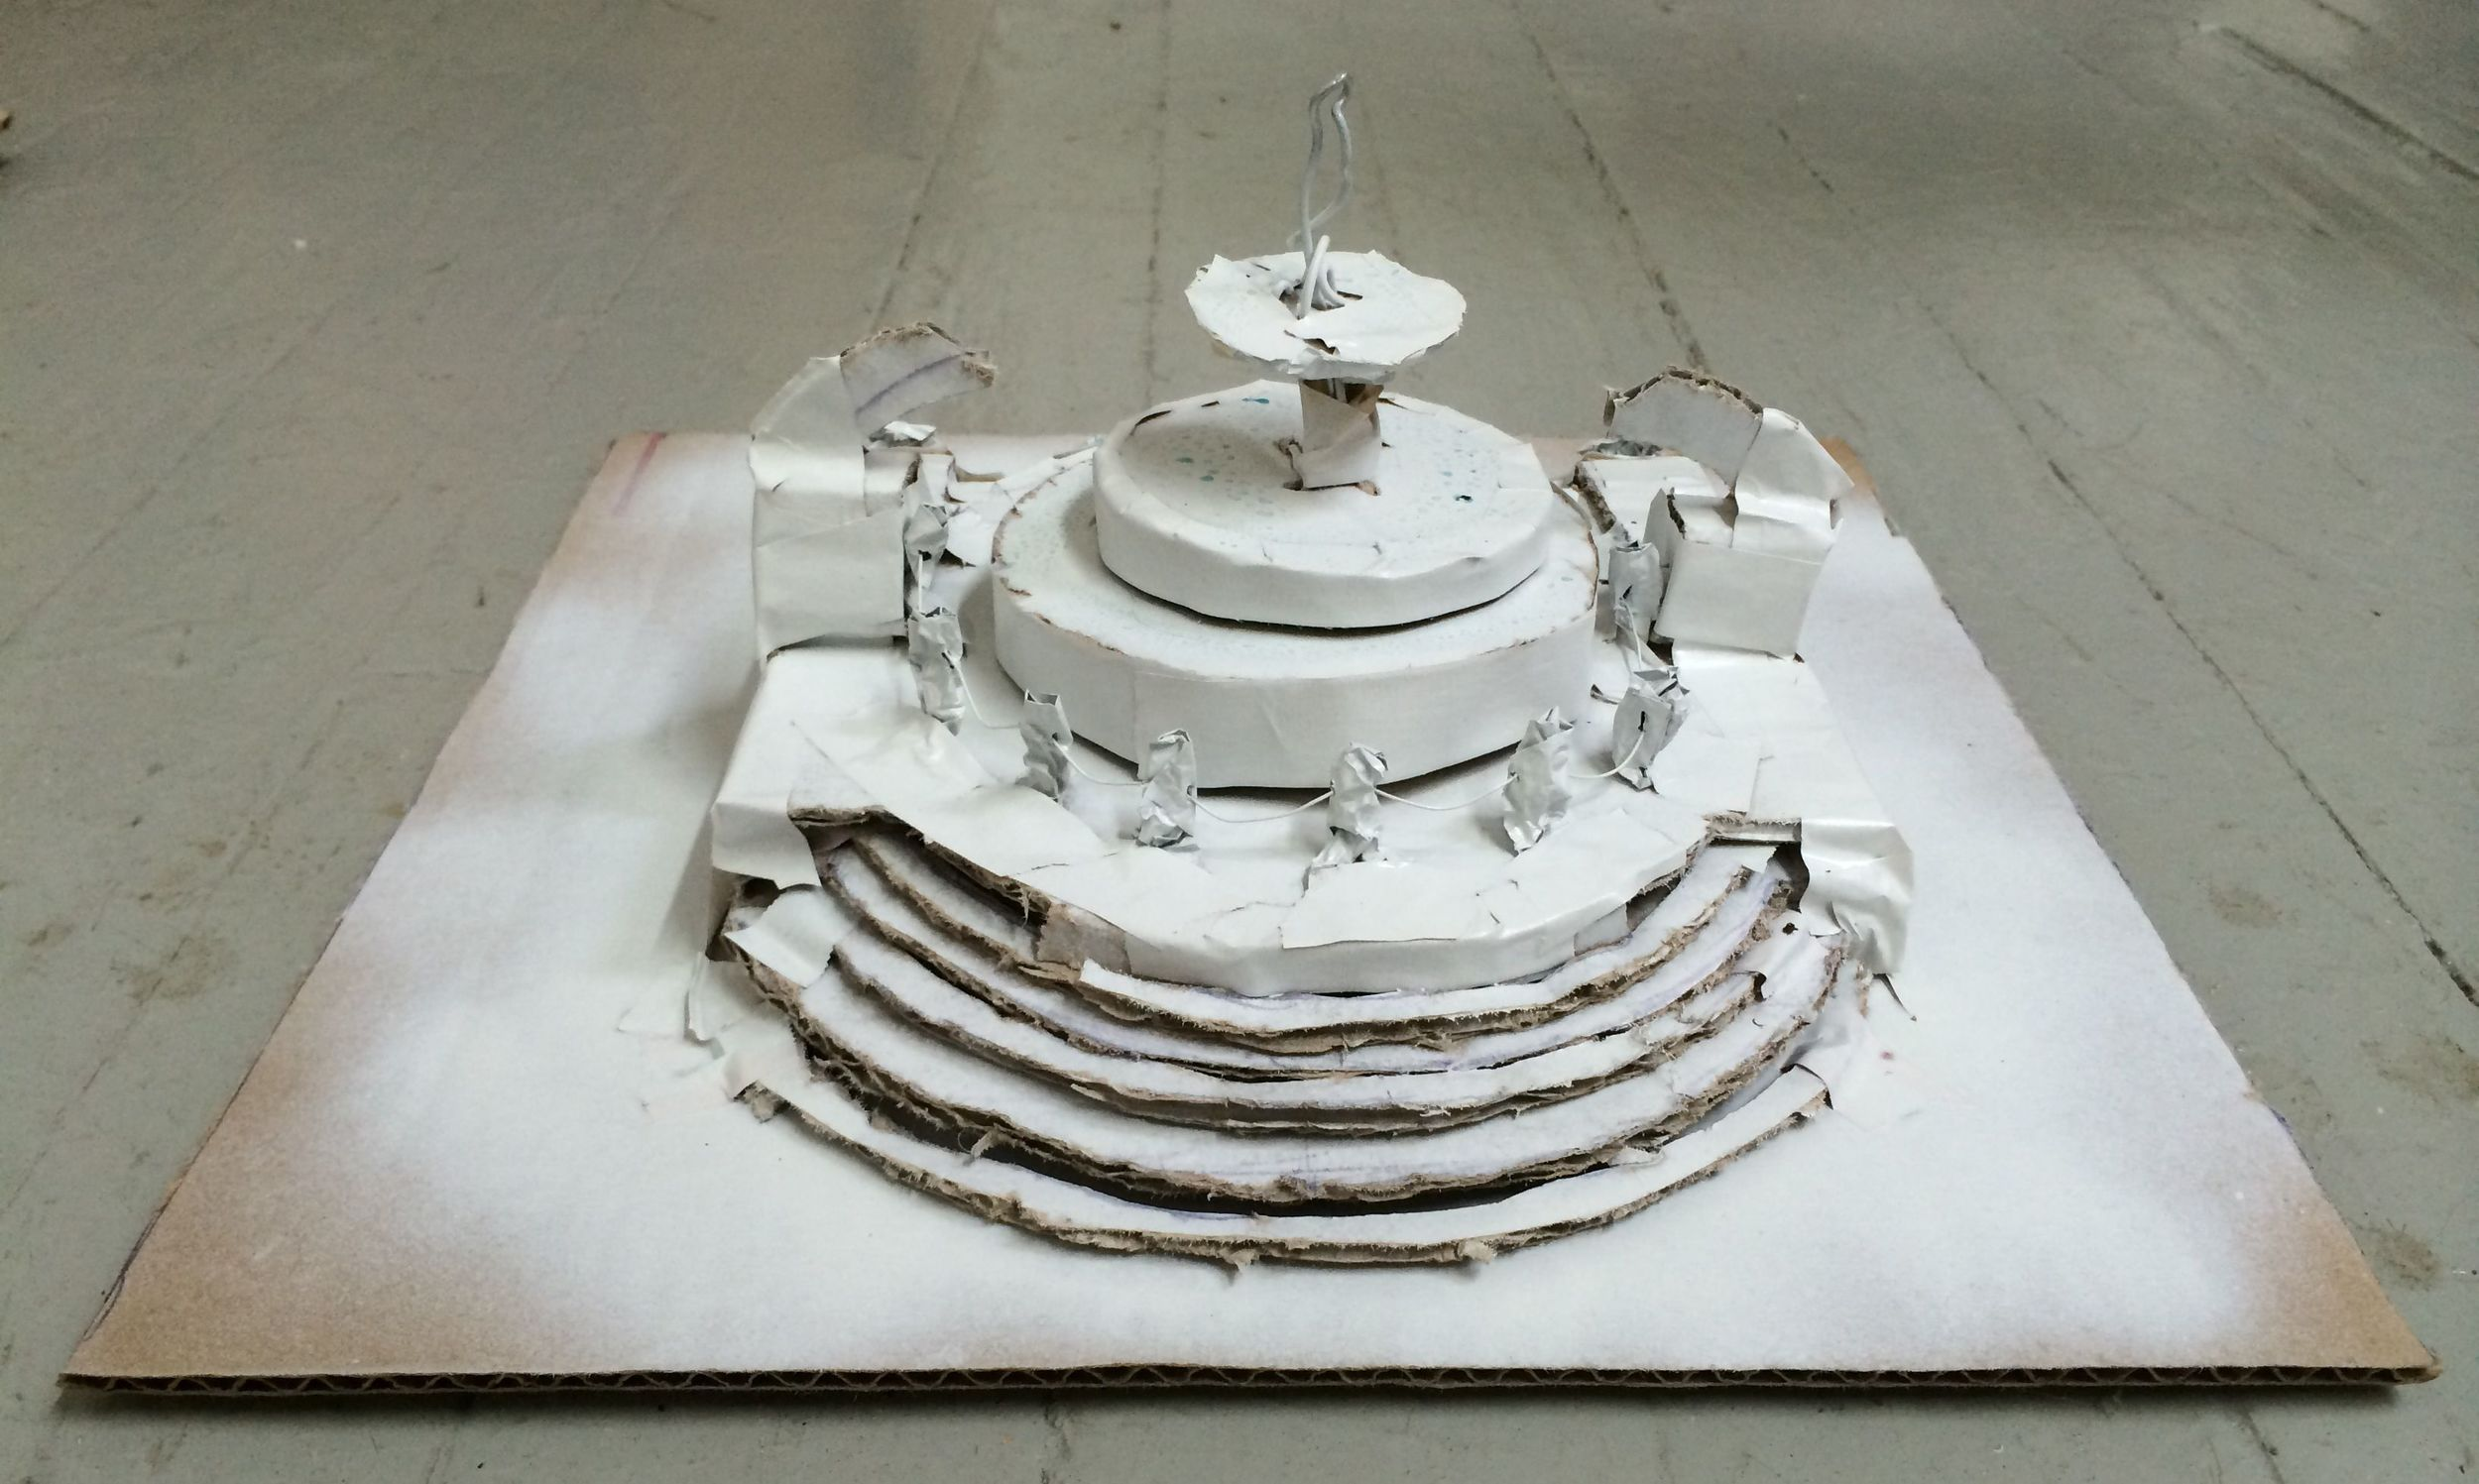 m2m-1-carolinebergonzi-exploration14.jpg